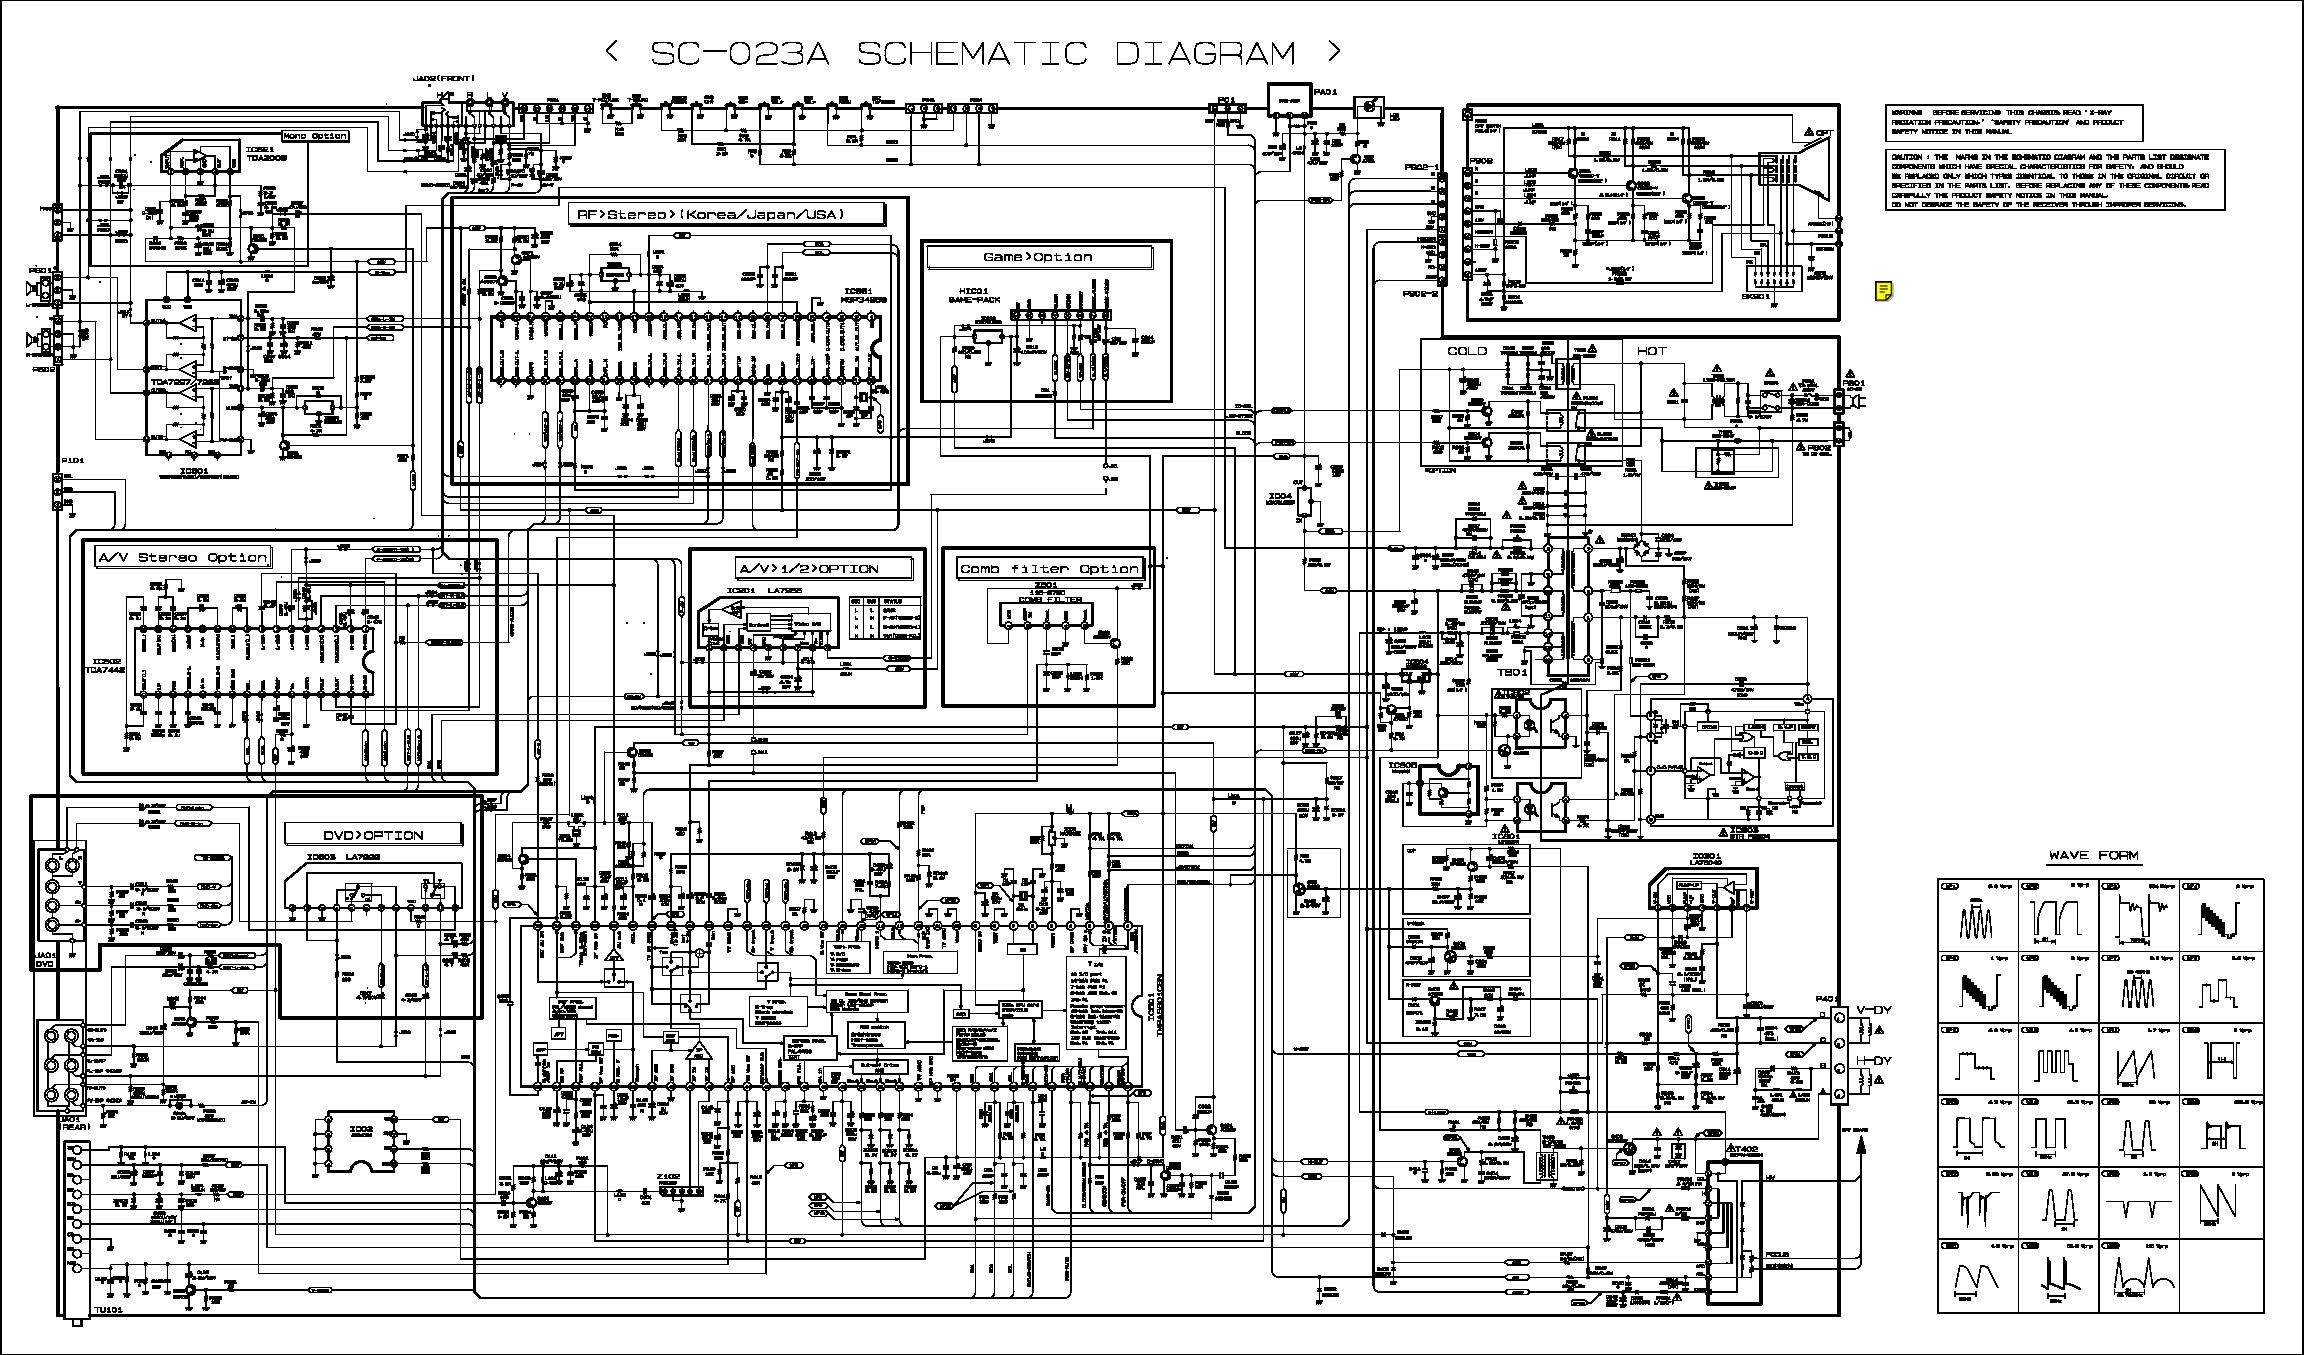 Lg Lg Cp 20j52a Pdf Diagramas De Televisores Lcd Y Plasma  U2013 Diagramasde Com  U2013 Diagramas